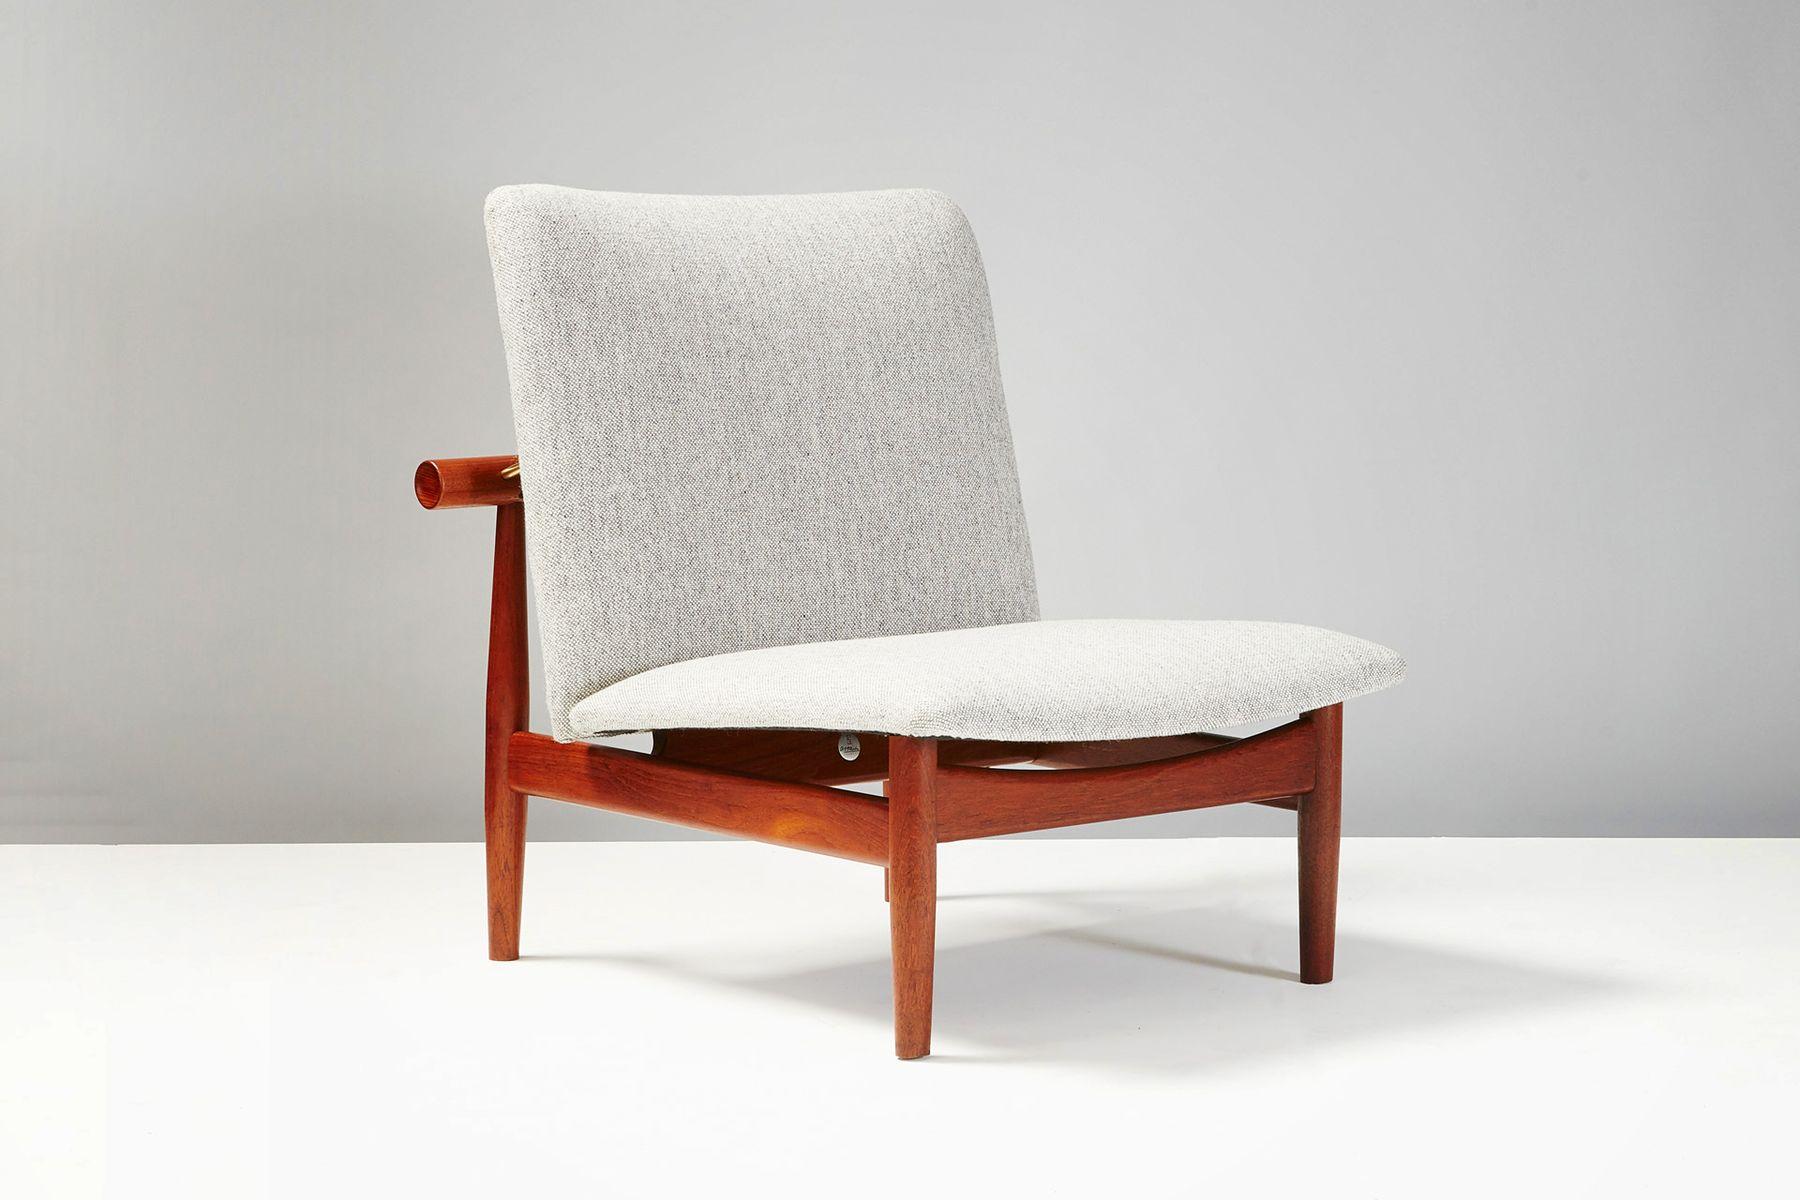 finn juhl chair uk foldable makeup model 137 japan by for france and søn 1953